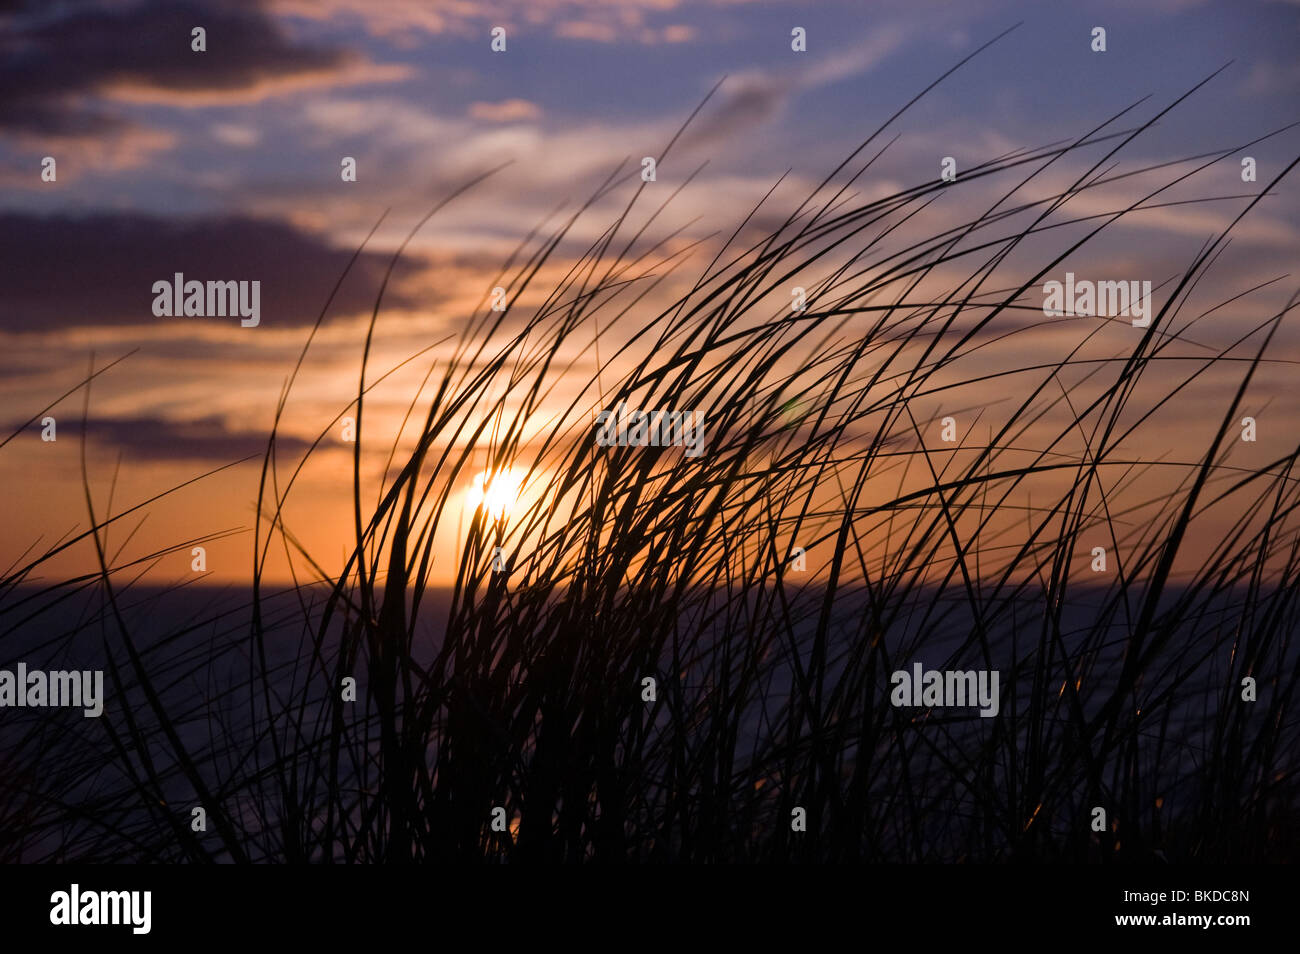 Cape Cod National Seashore, Provincetown, Massachusetts - Stock Image